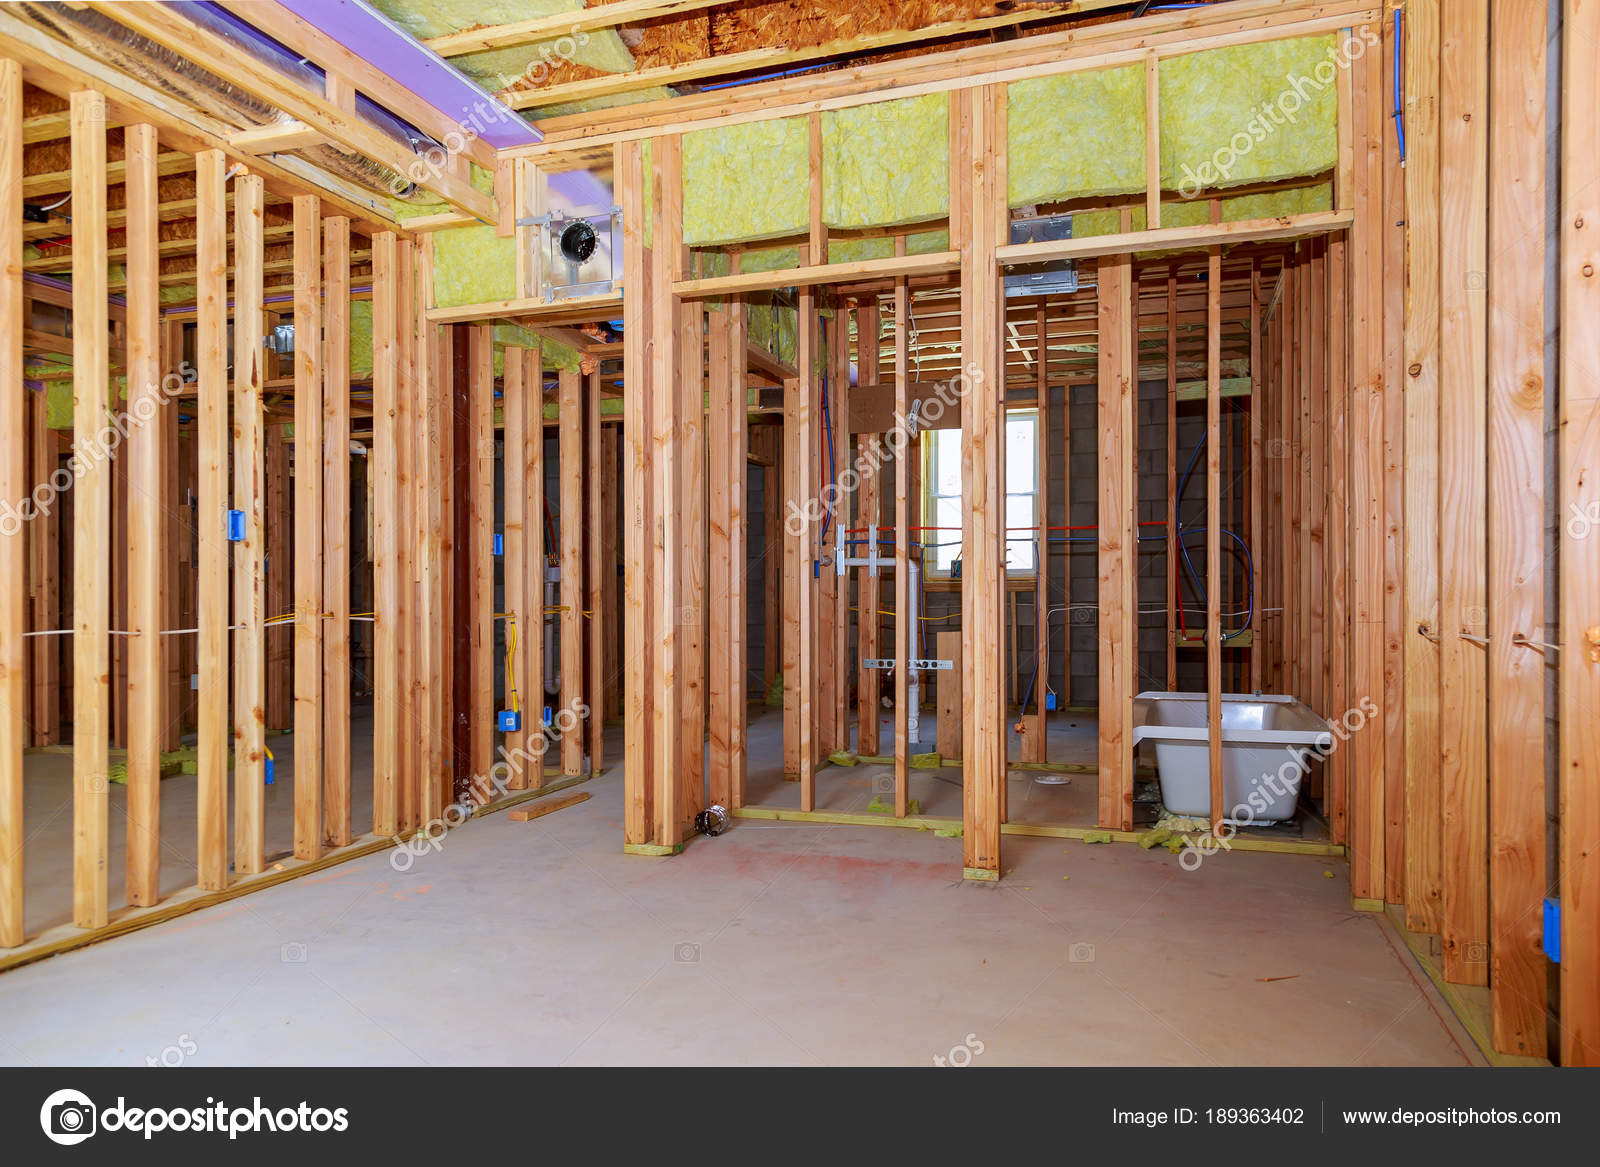 https://st3.depositphotos.com/2954445/18936/i/1600/depositphotos_189363402-stock-photo-interior-wall-framing-with-piping.jpg